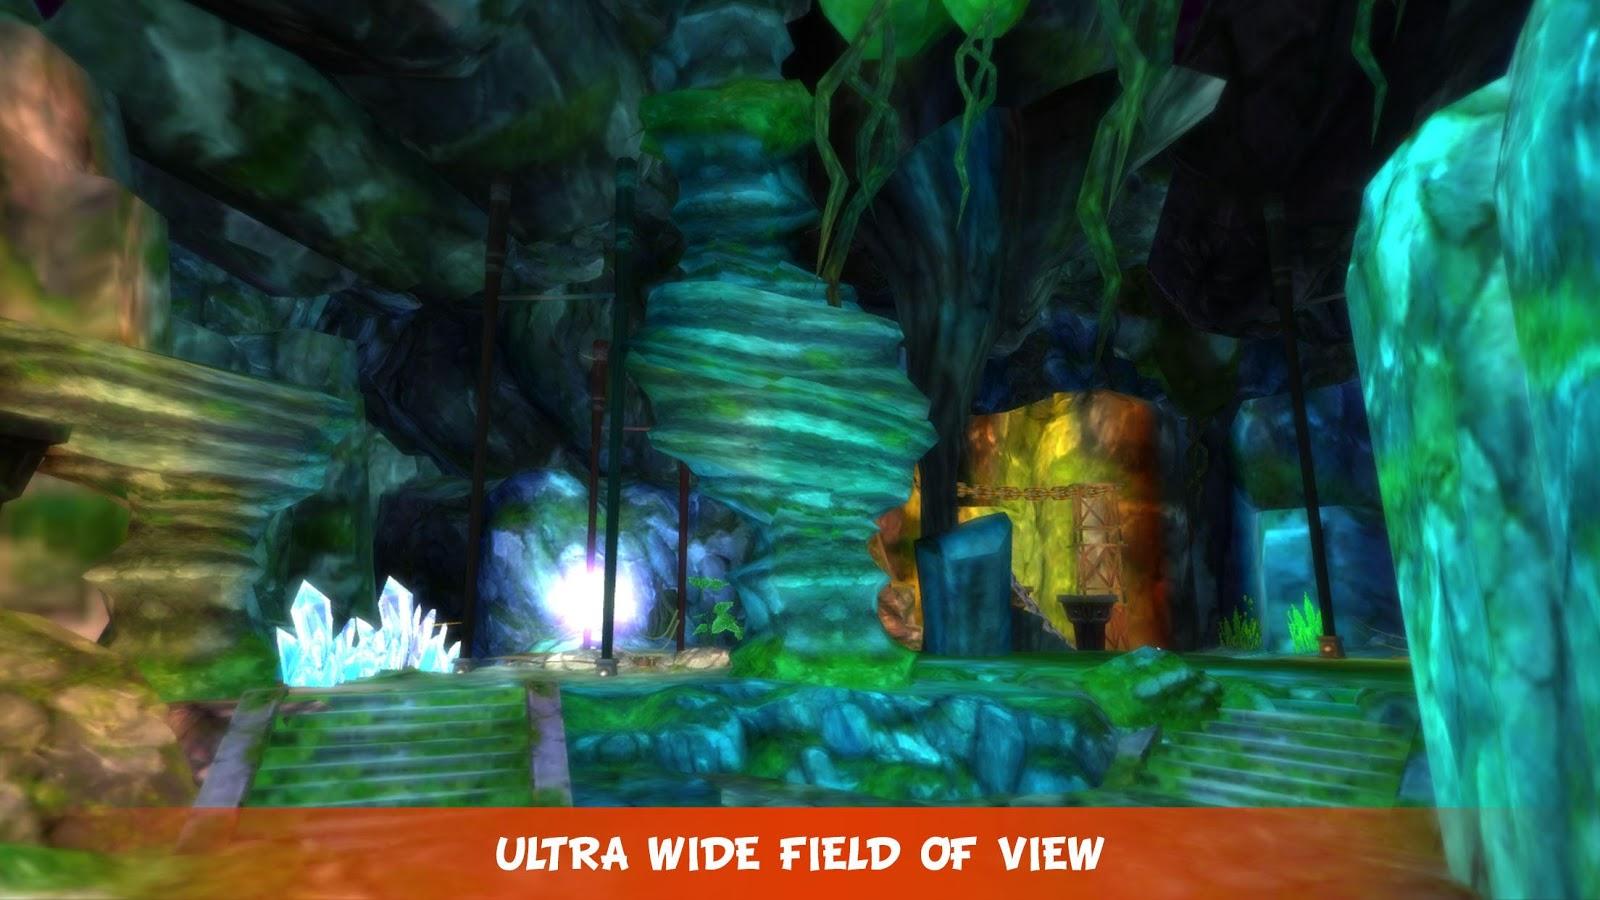 VR CAVE 3D Game - FREE 360 Virtual Reality tour 1 0 APK